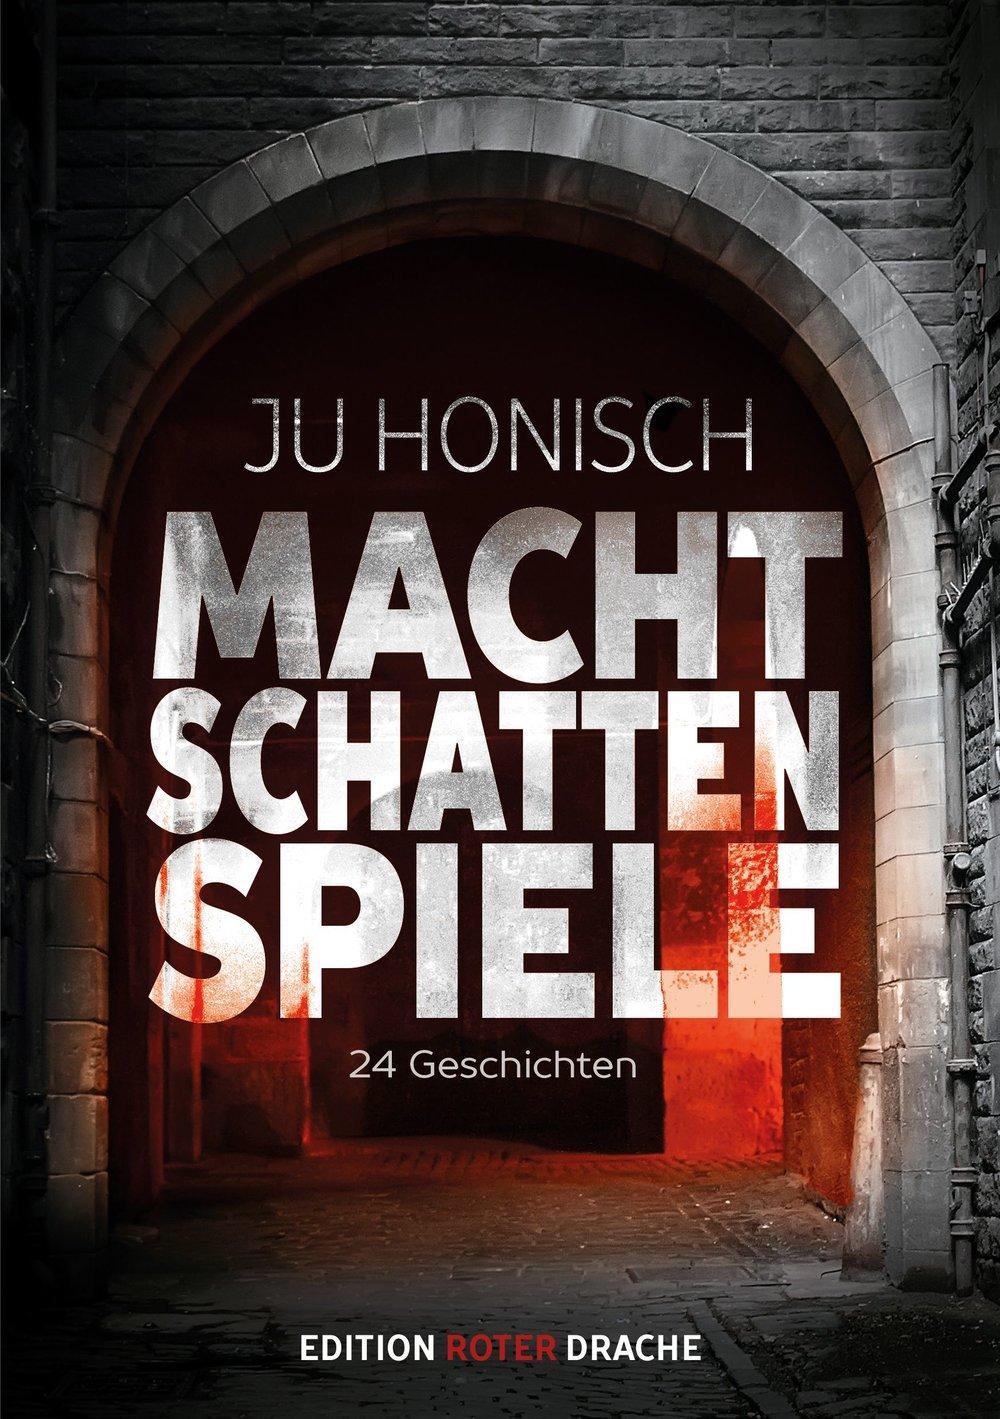 Honisch_Ju_Machtschattenspiele_Phantastik-Autoren-Netzwerk.jpg